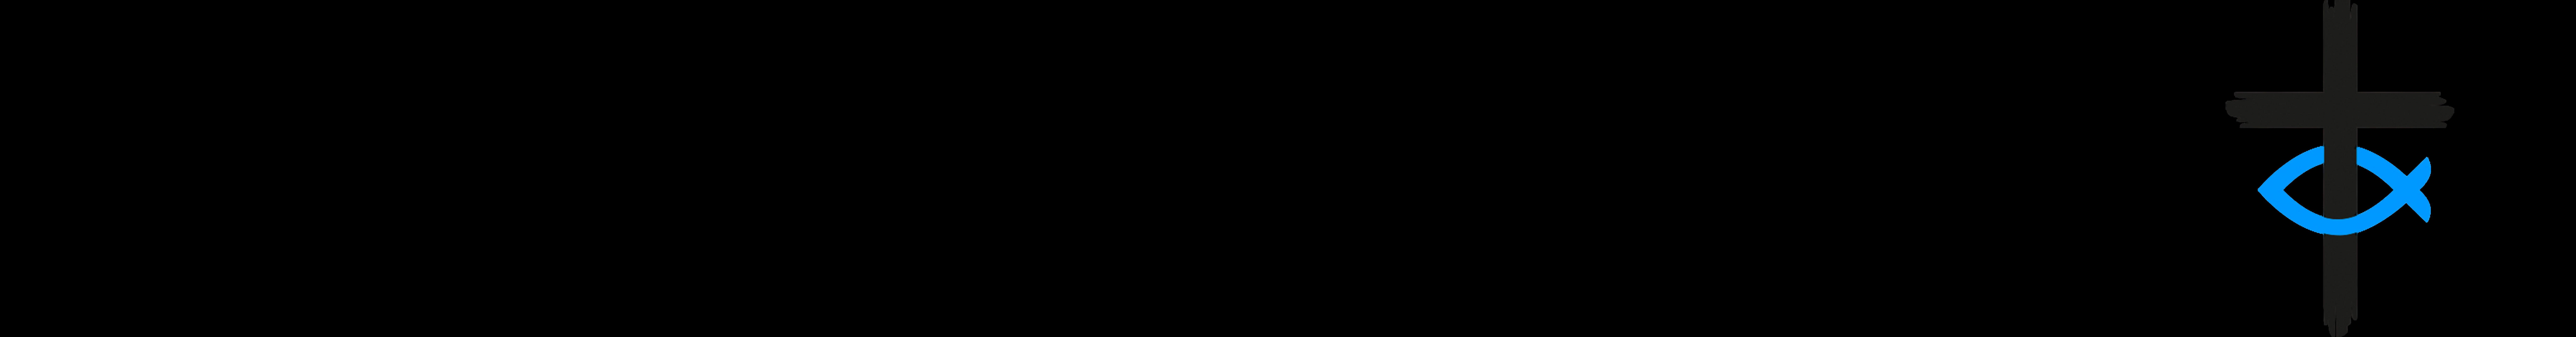 Hallfold URC